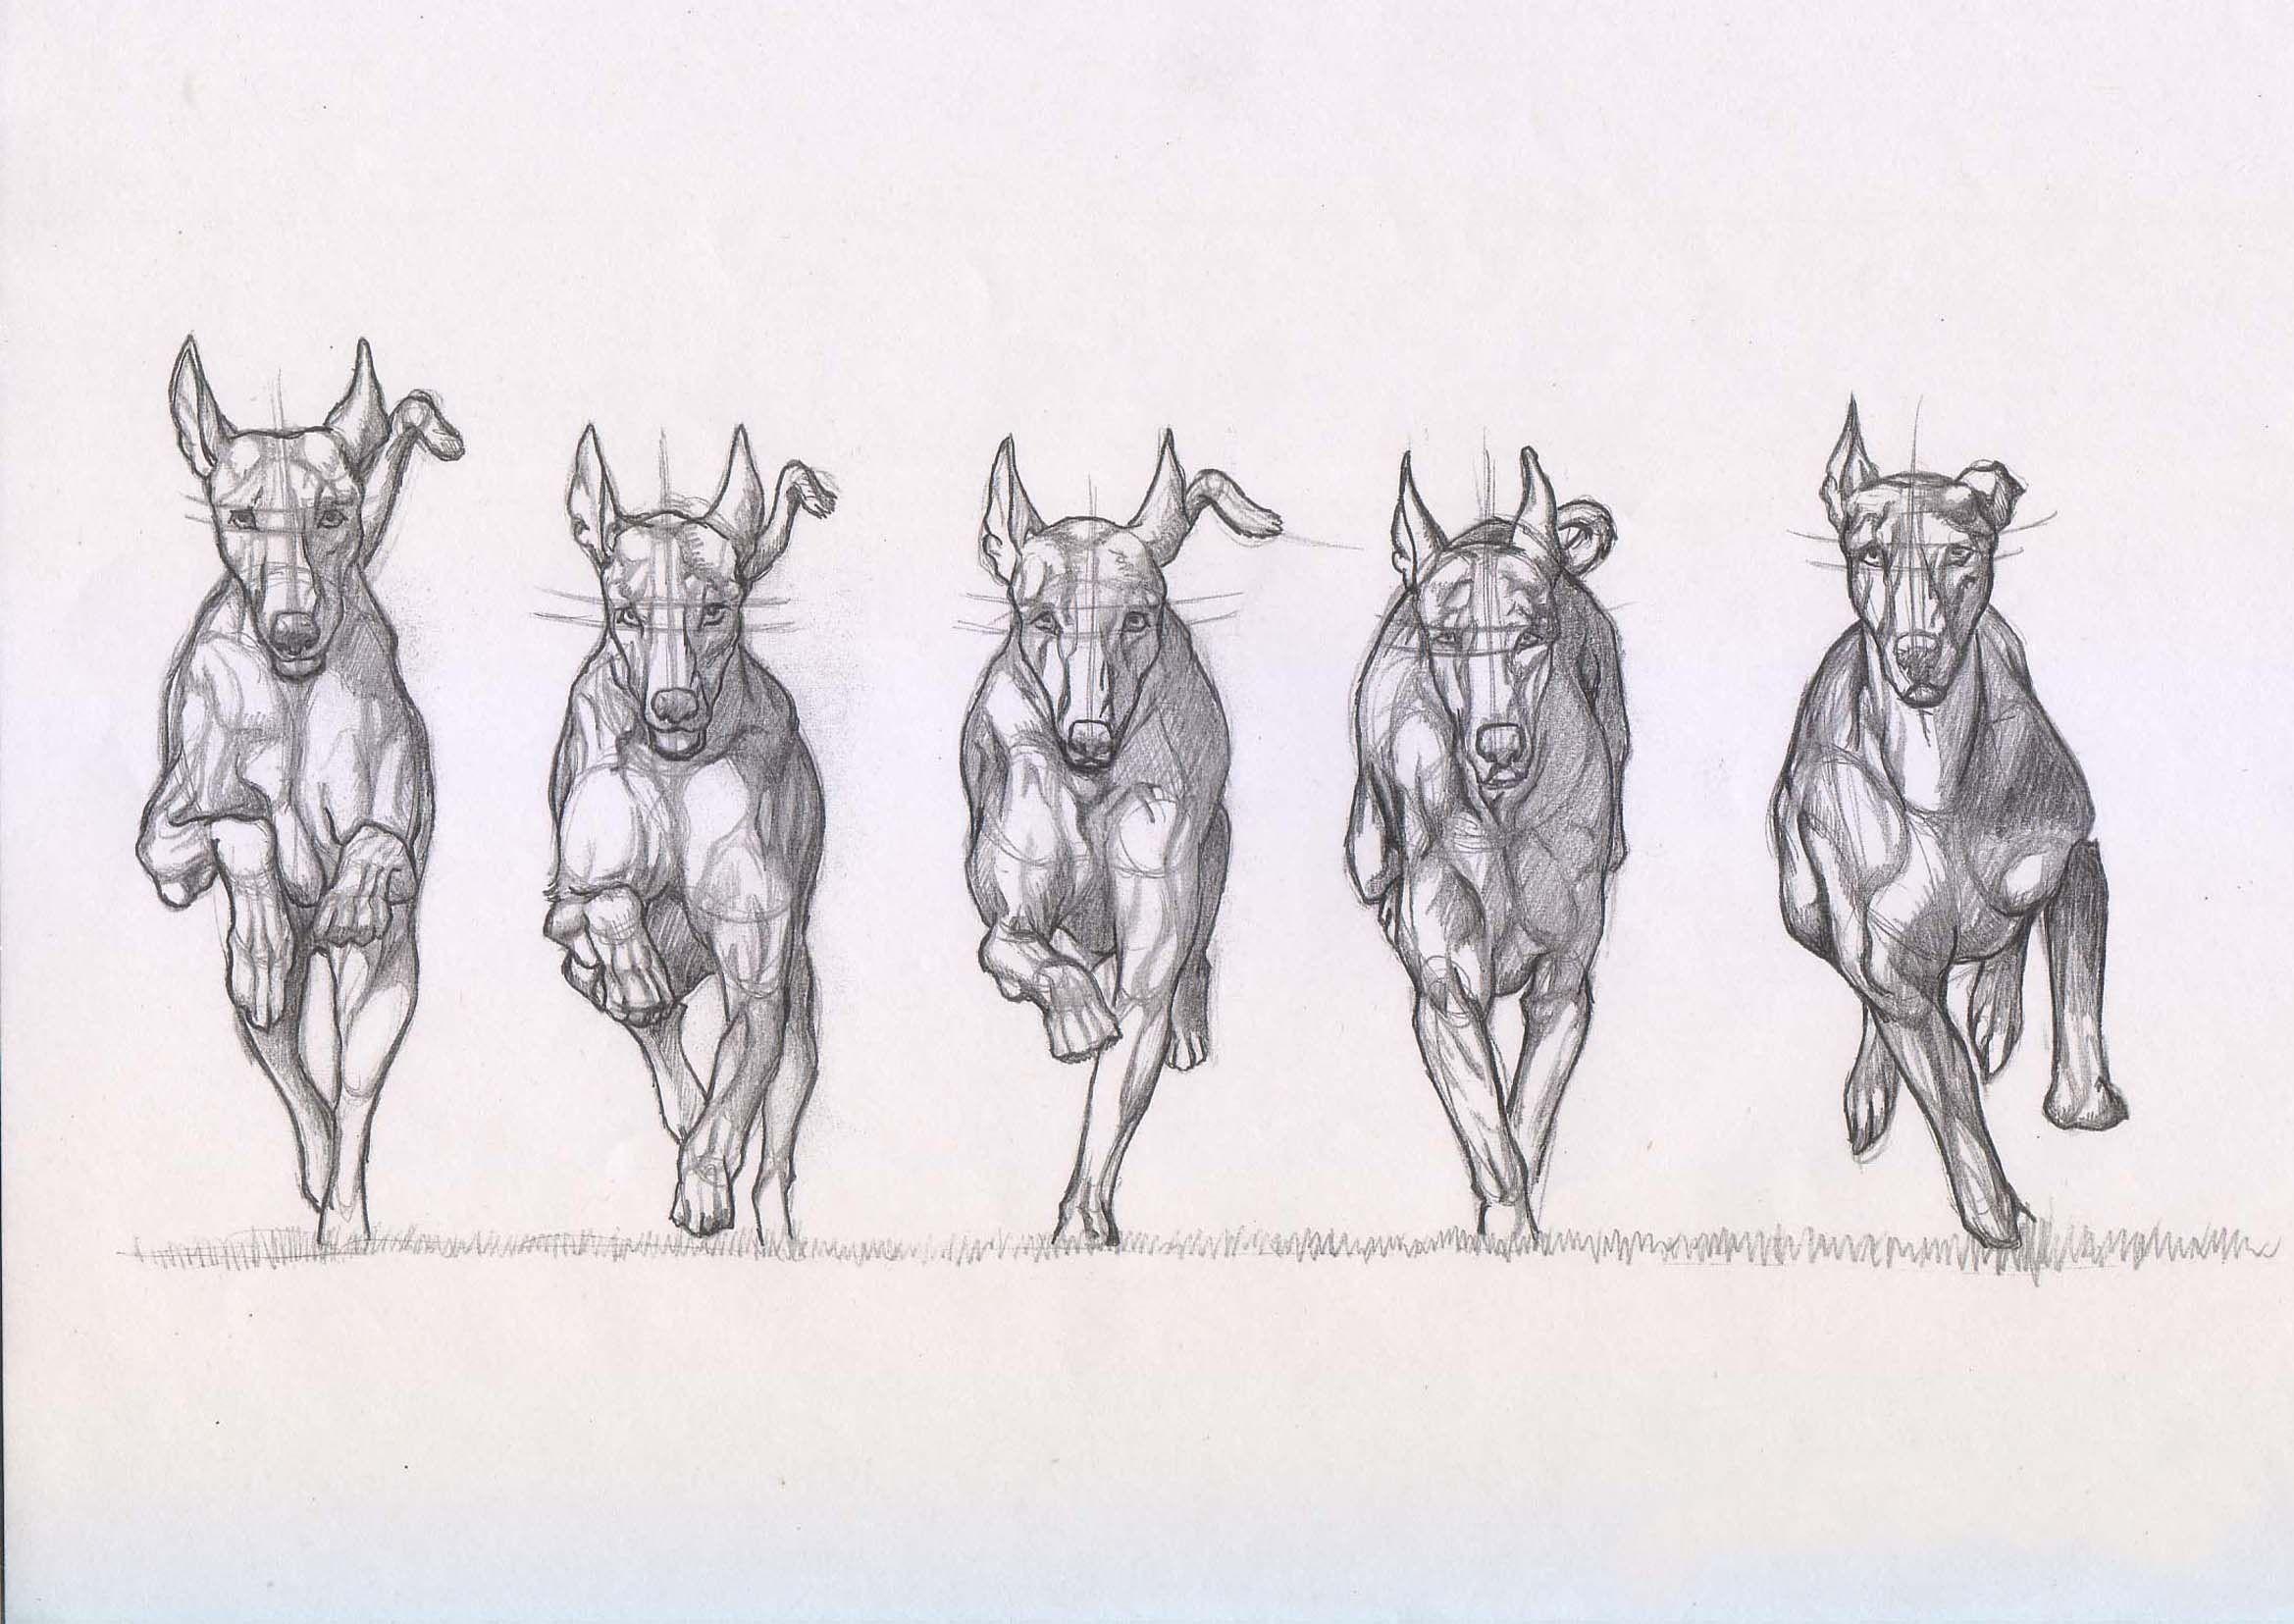 Pin de se en Dog drawings | Pinterest | Dibujo, Dibujos de animales ...